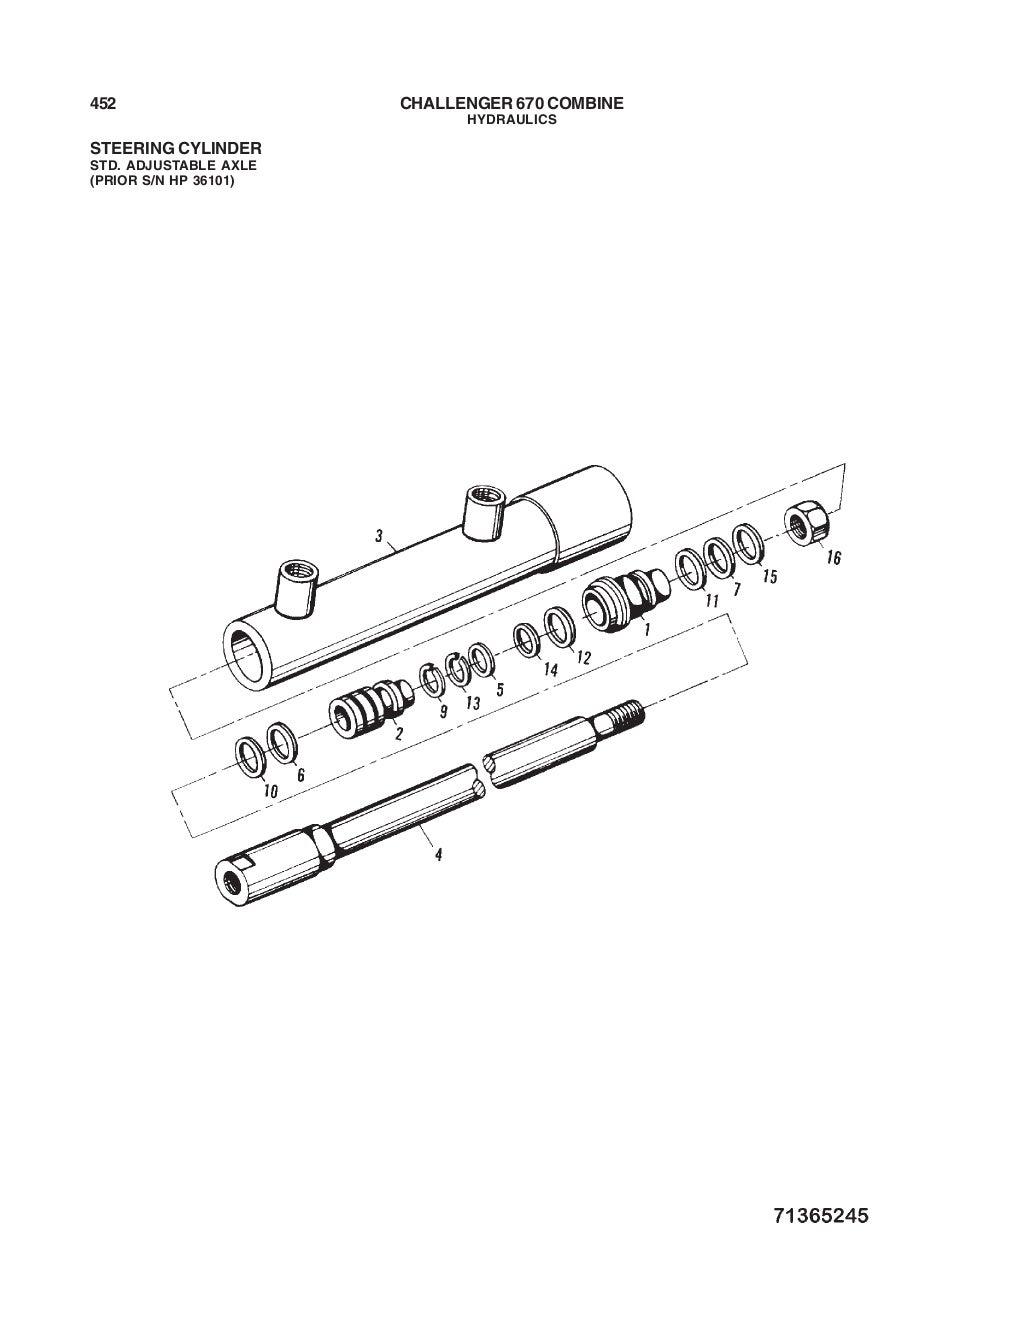 670 Challenger combine parts manual